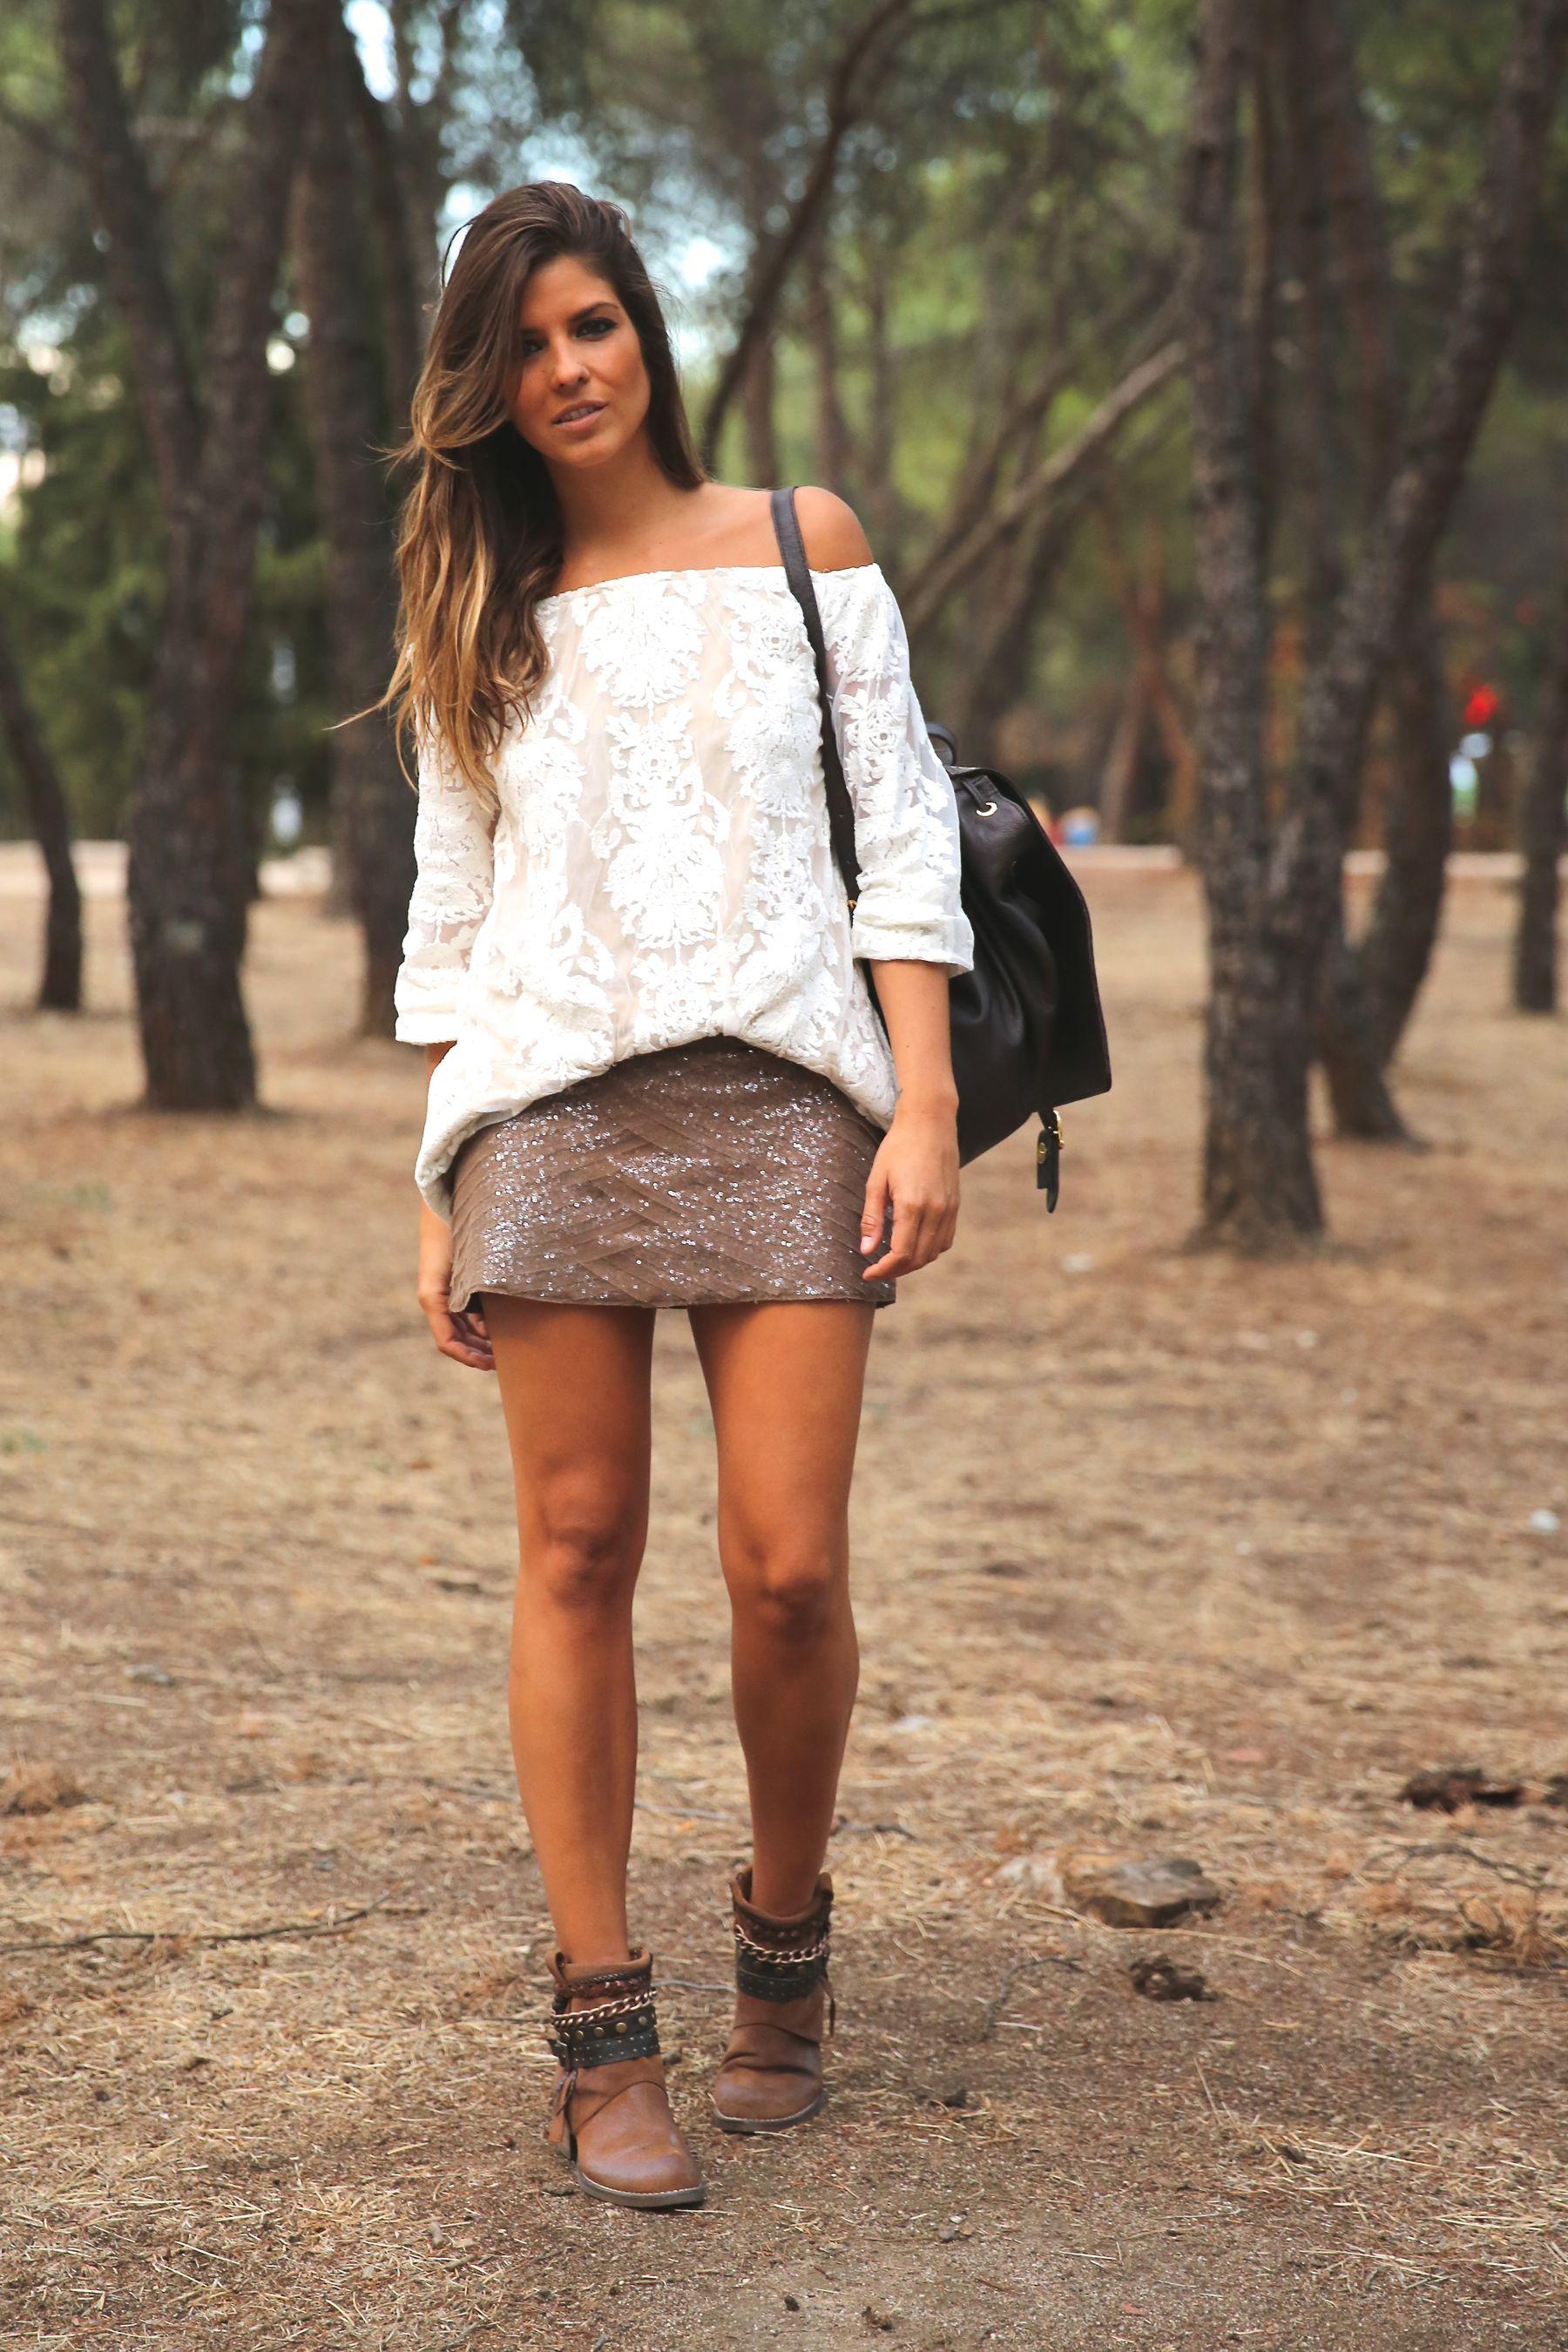 trendy_taste-look-outfit-street_style-ootd-blog-blogger-fashion_spain-moda_españa-primavera/verano-boho-trendy-planes_de_día-lentejuelas-falda-botines-étnico-mochila-crochet-encaje-12